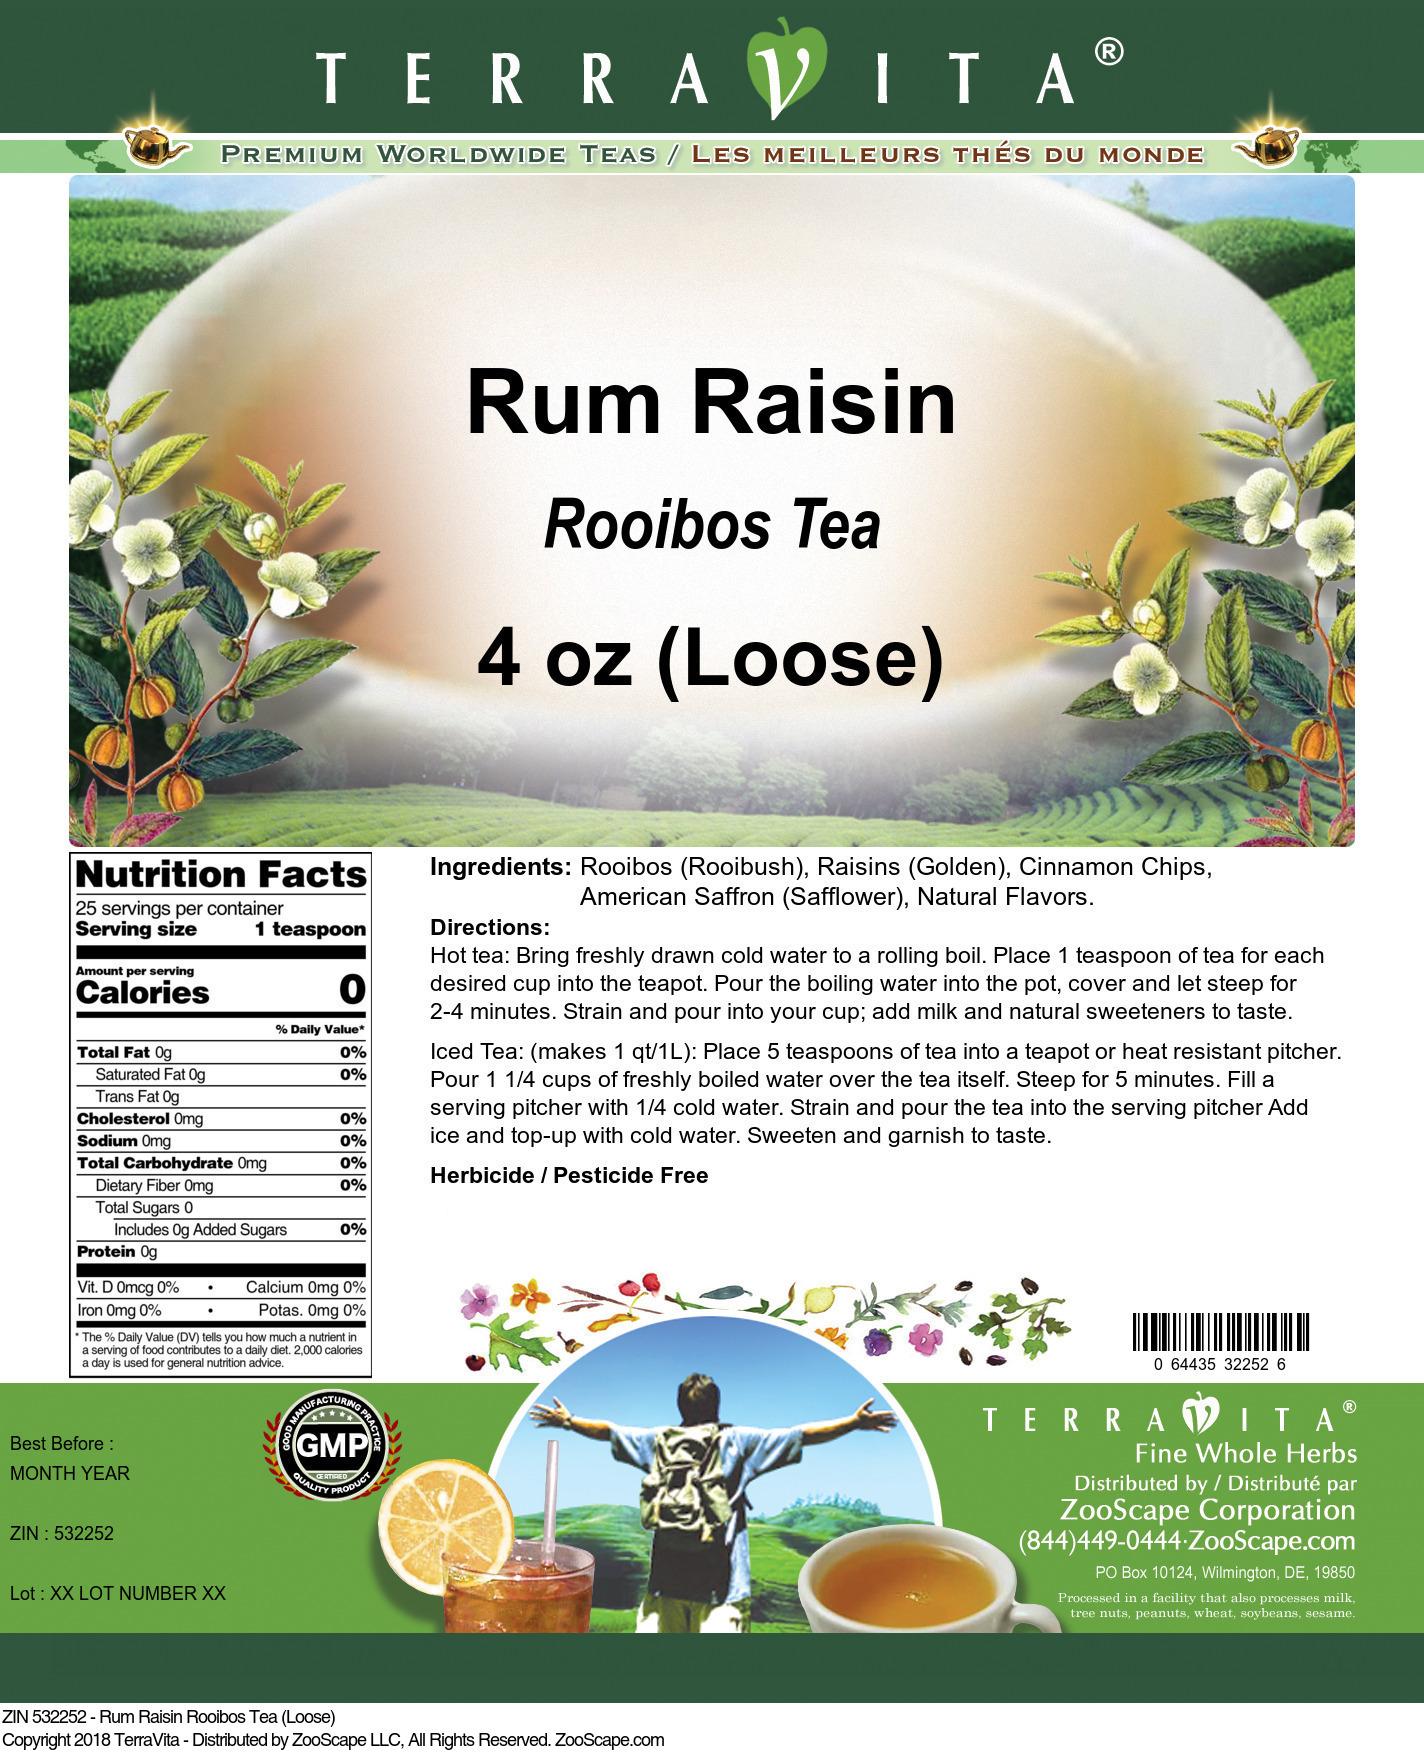 Rum Raisin Rooibos Tea (Loose)